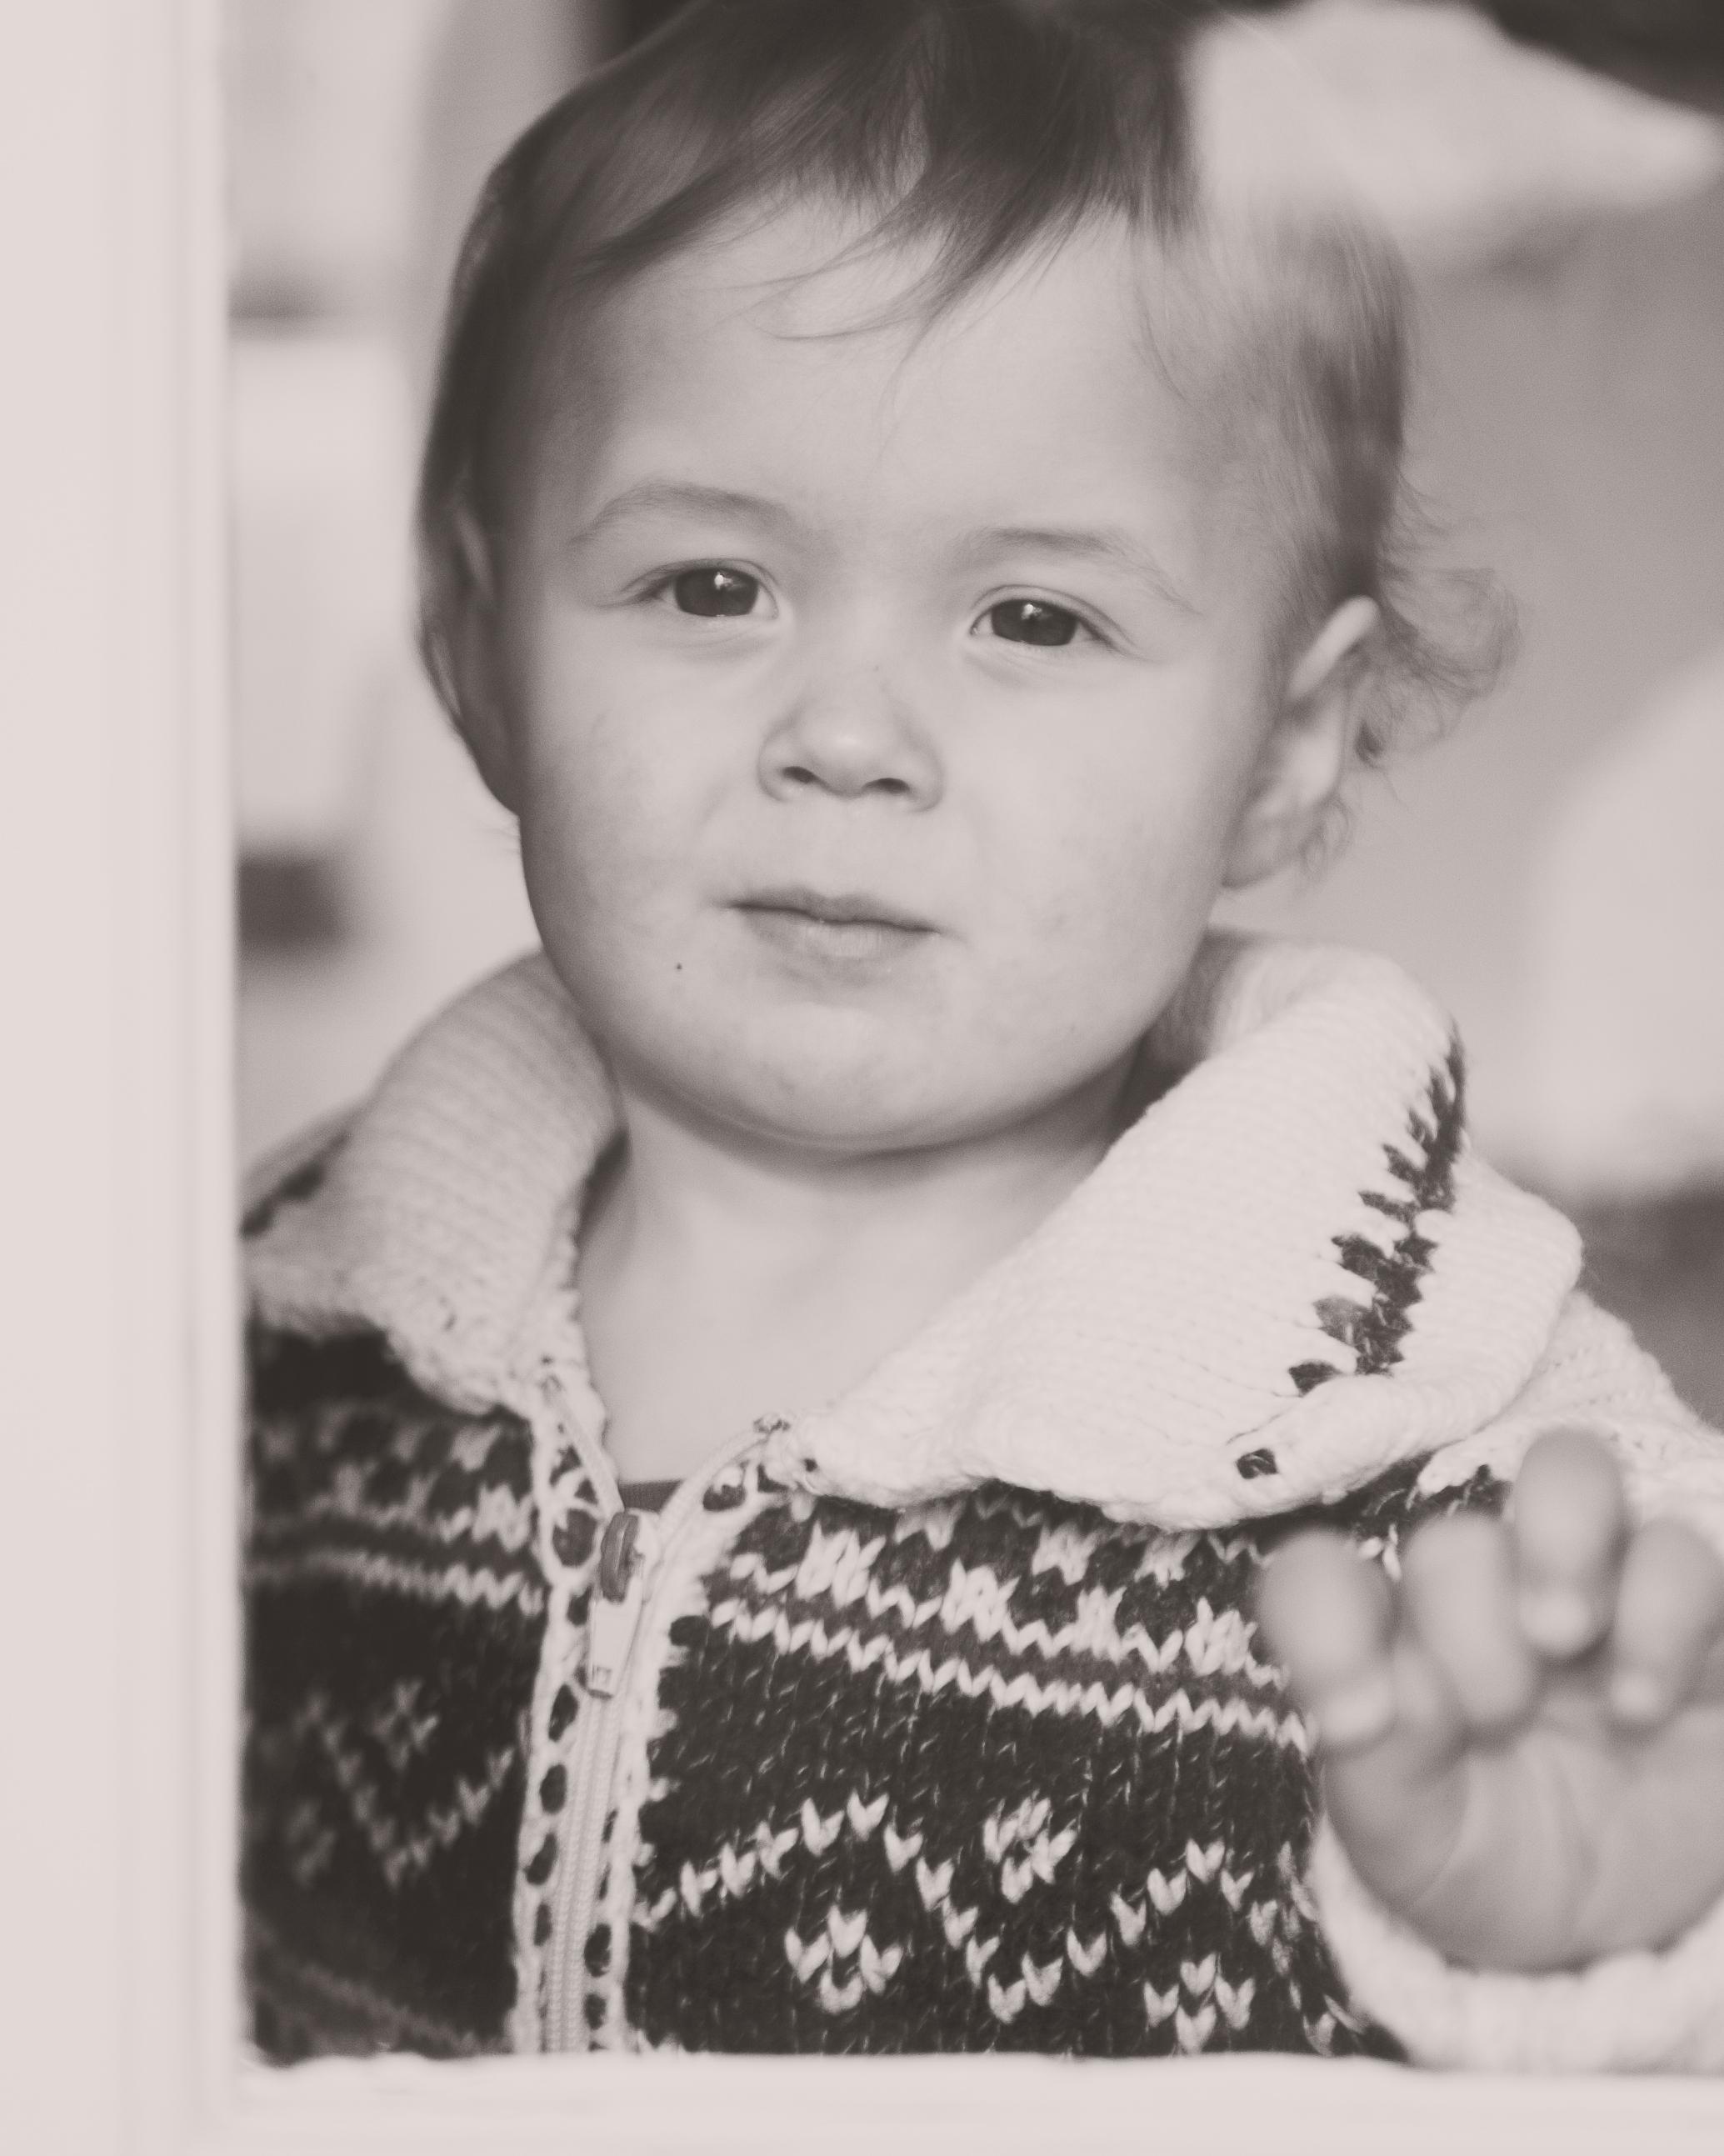 seattle-children-photographer-34.jpg